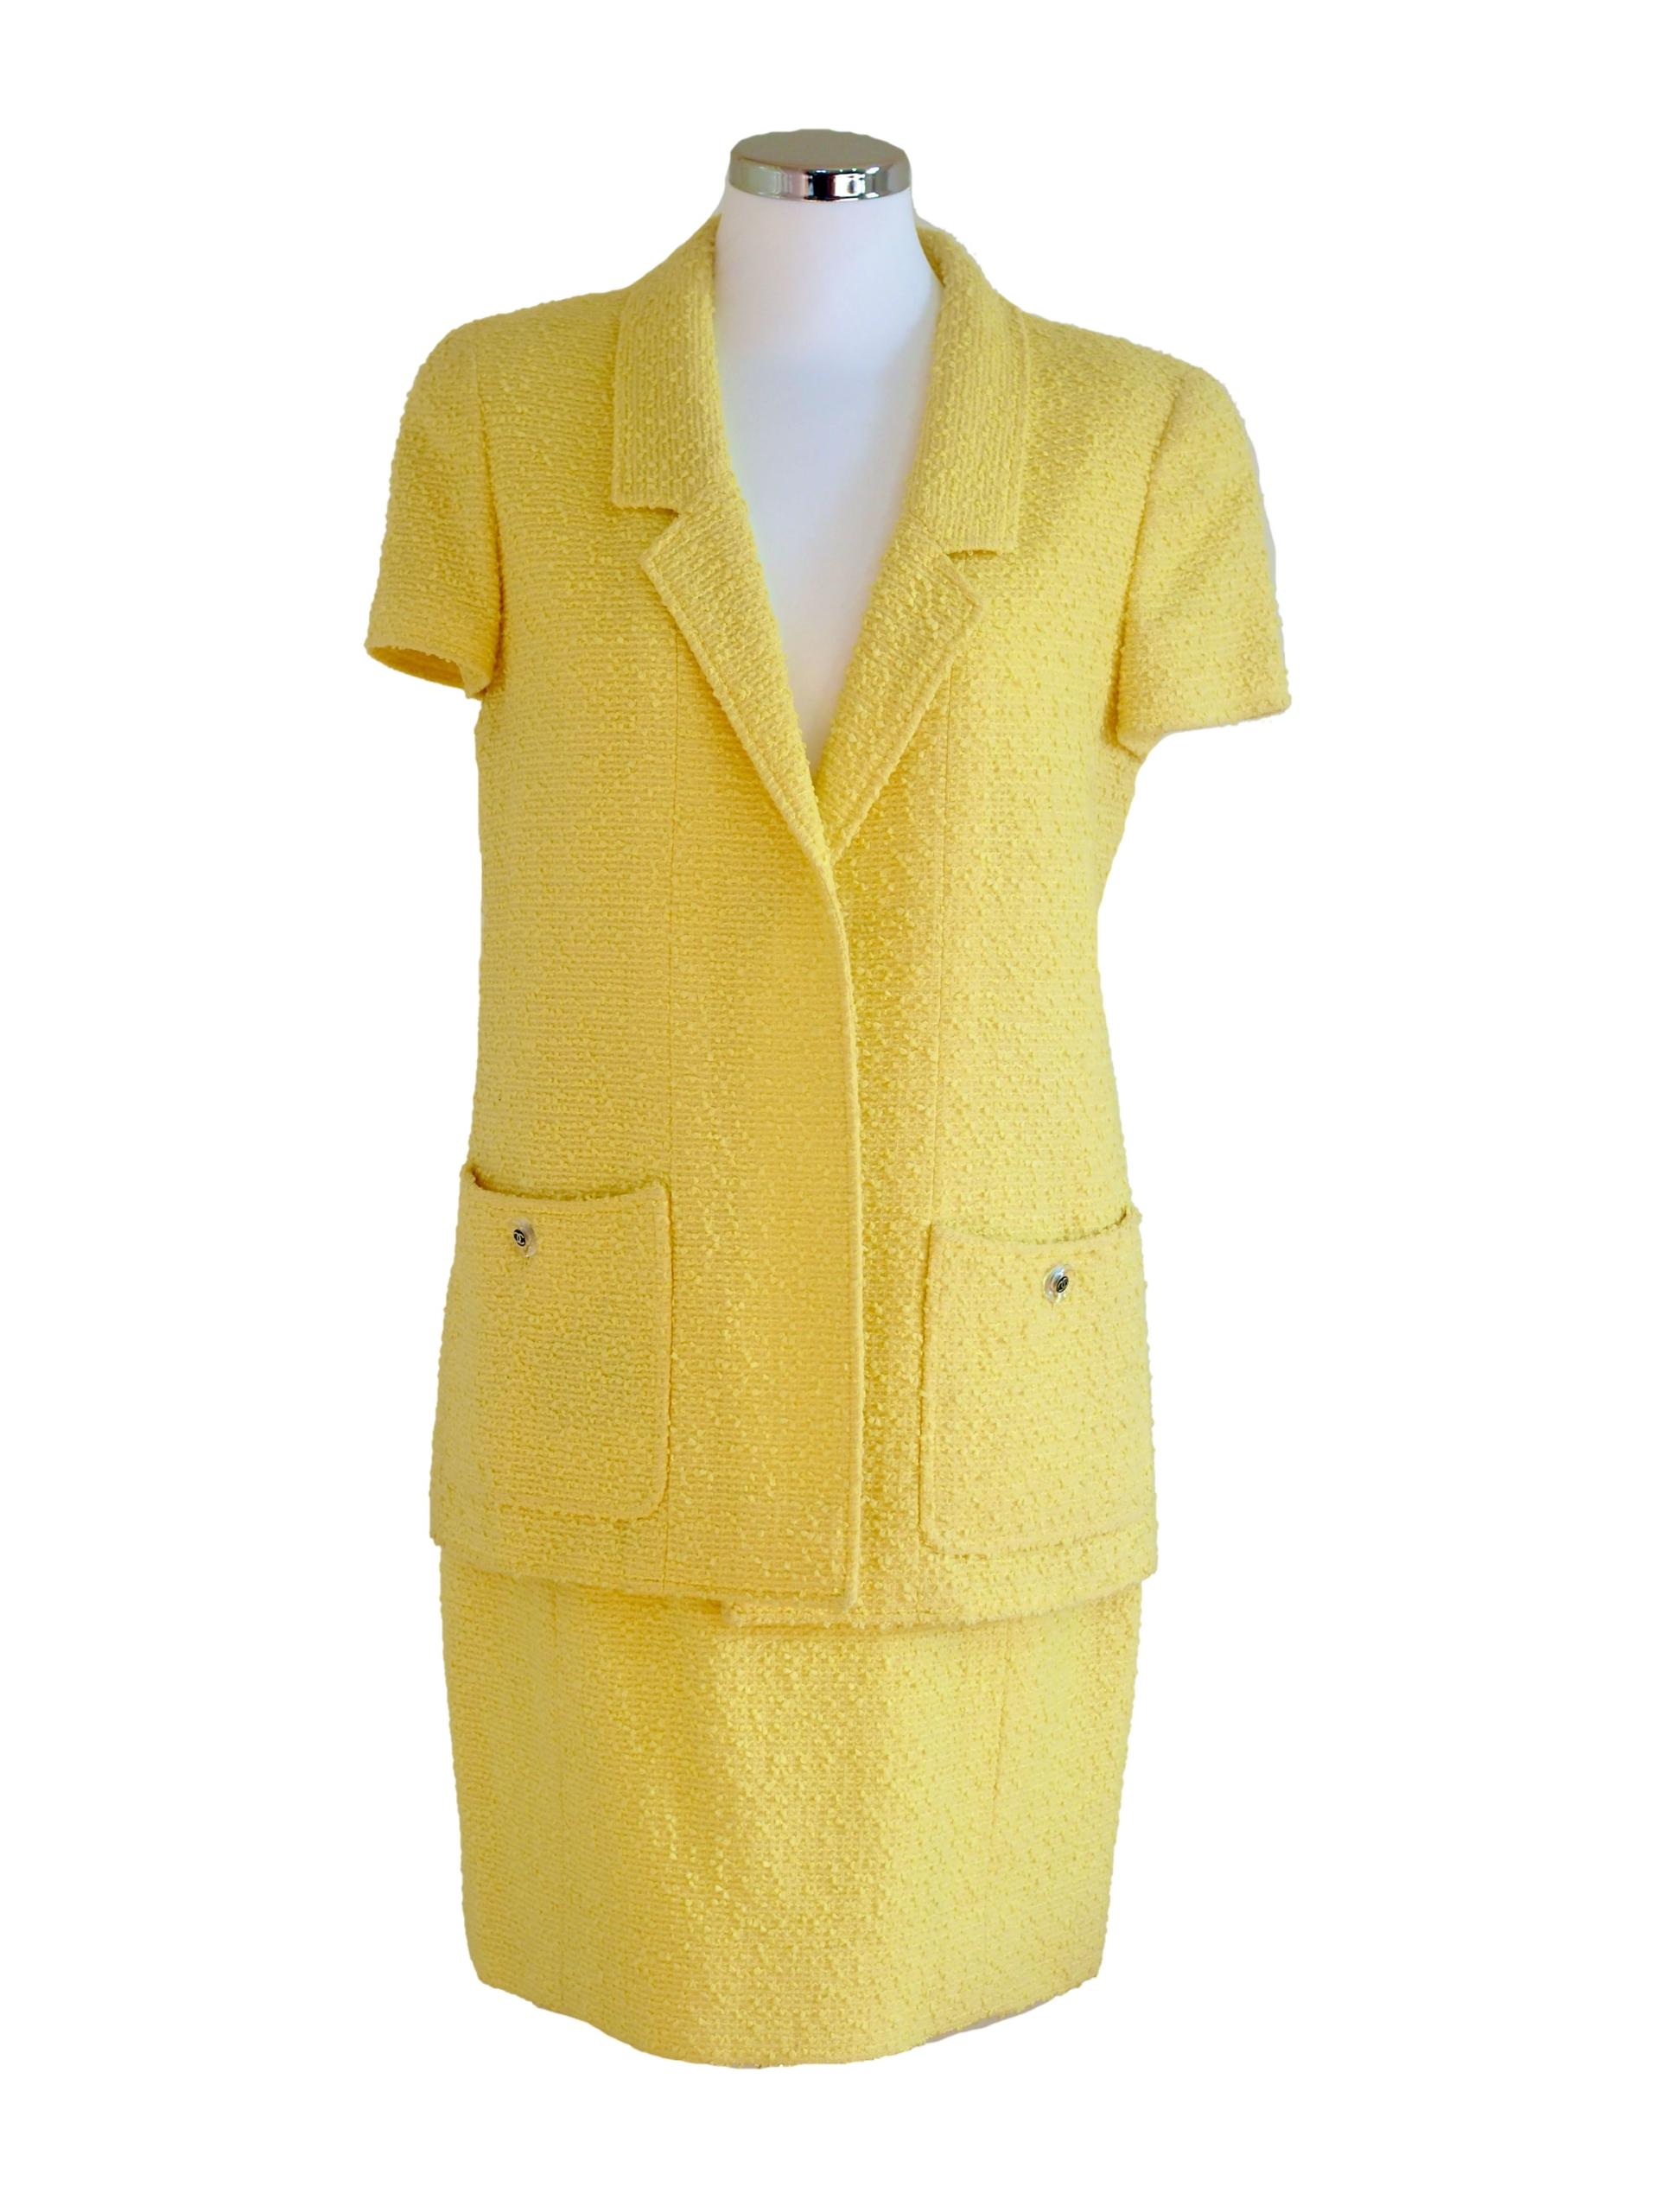 Suit CHANEL Yellow Boucle Size L